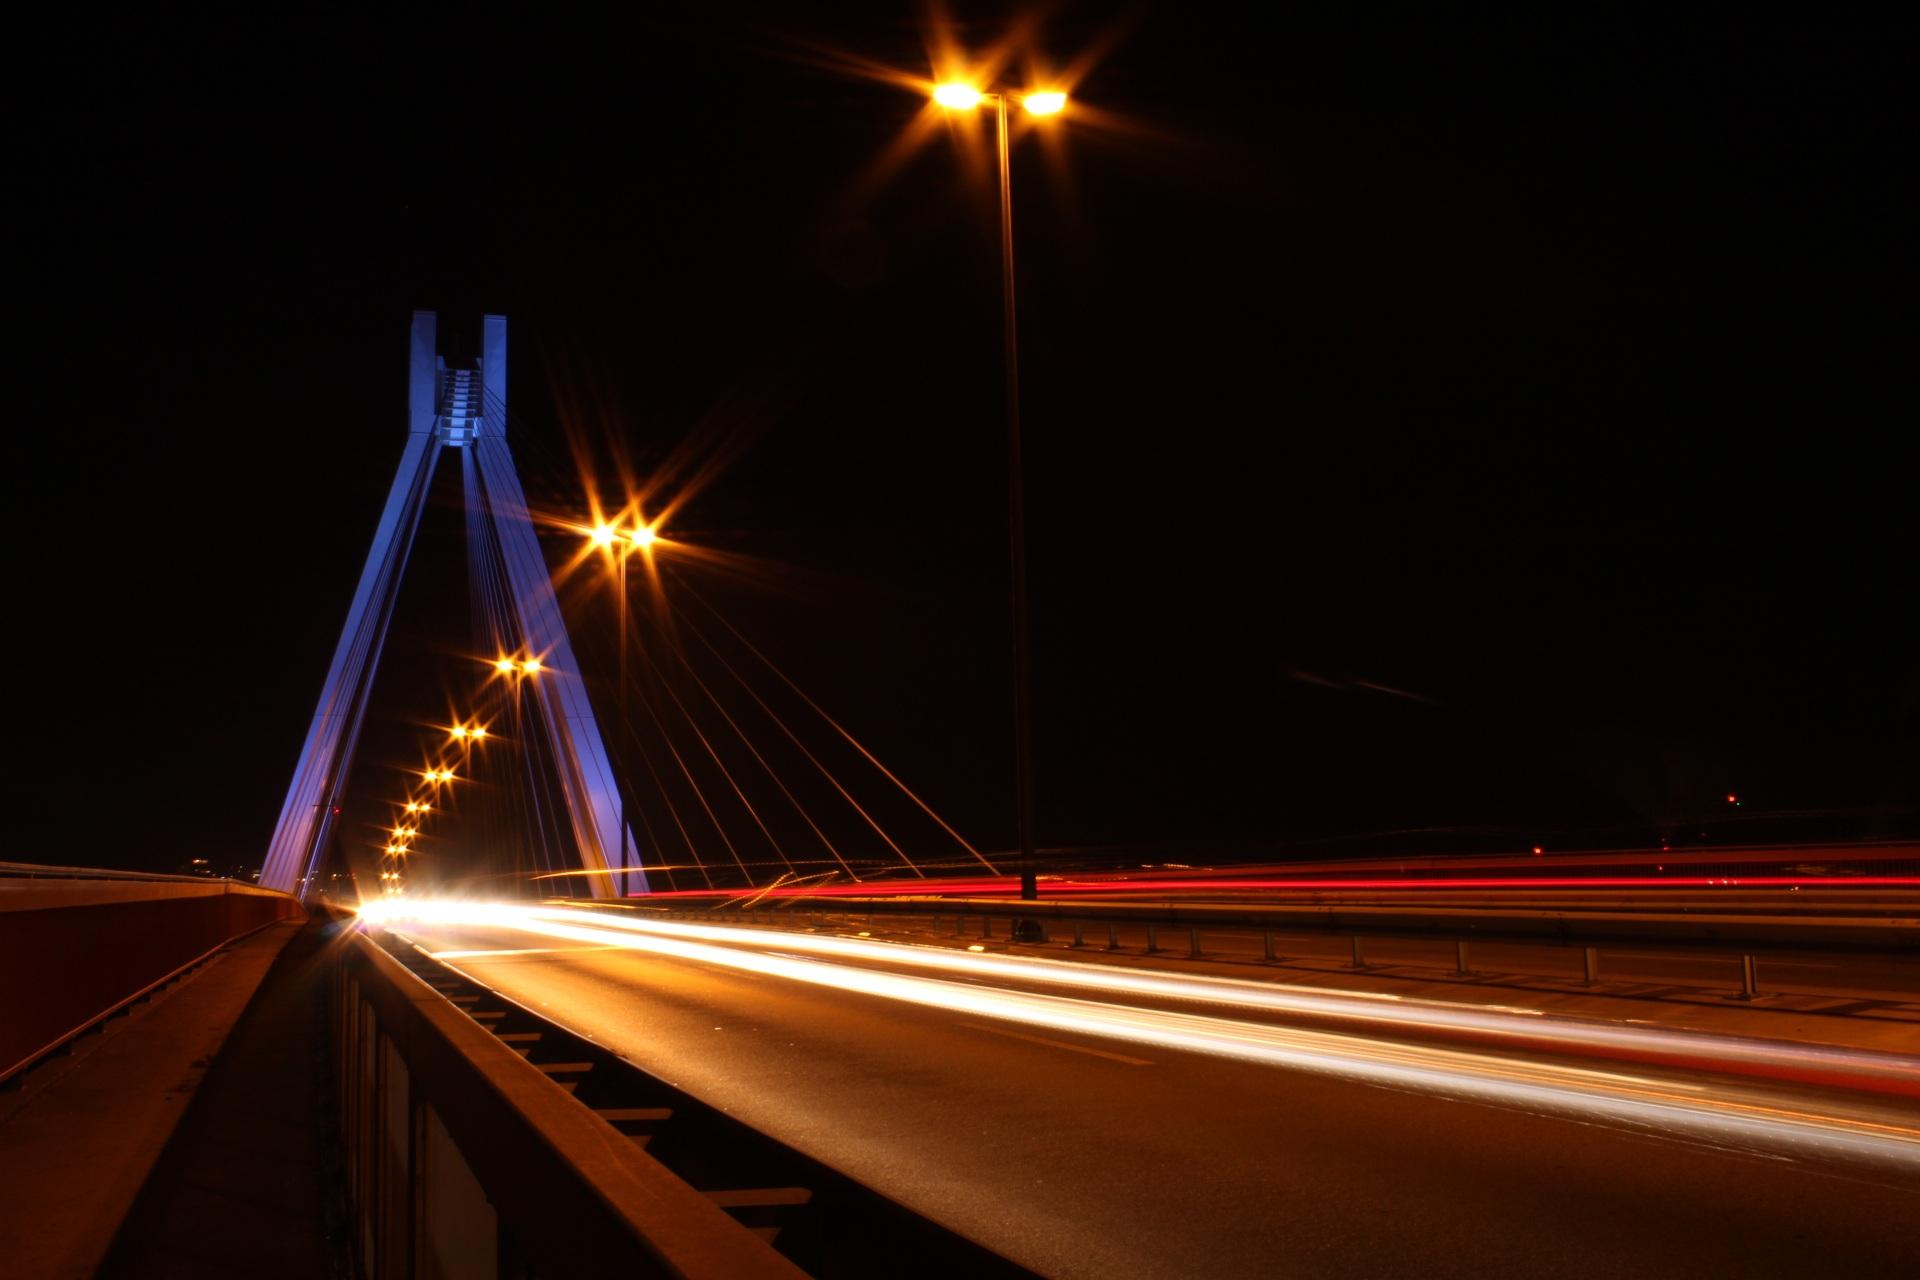 Gambar : jembatan, jalan, sinar matahari, Perkotaan, garis ... for gambar lampu menyala  110ylc